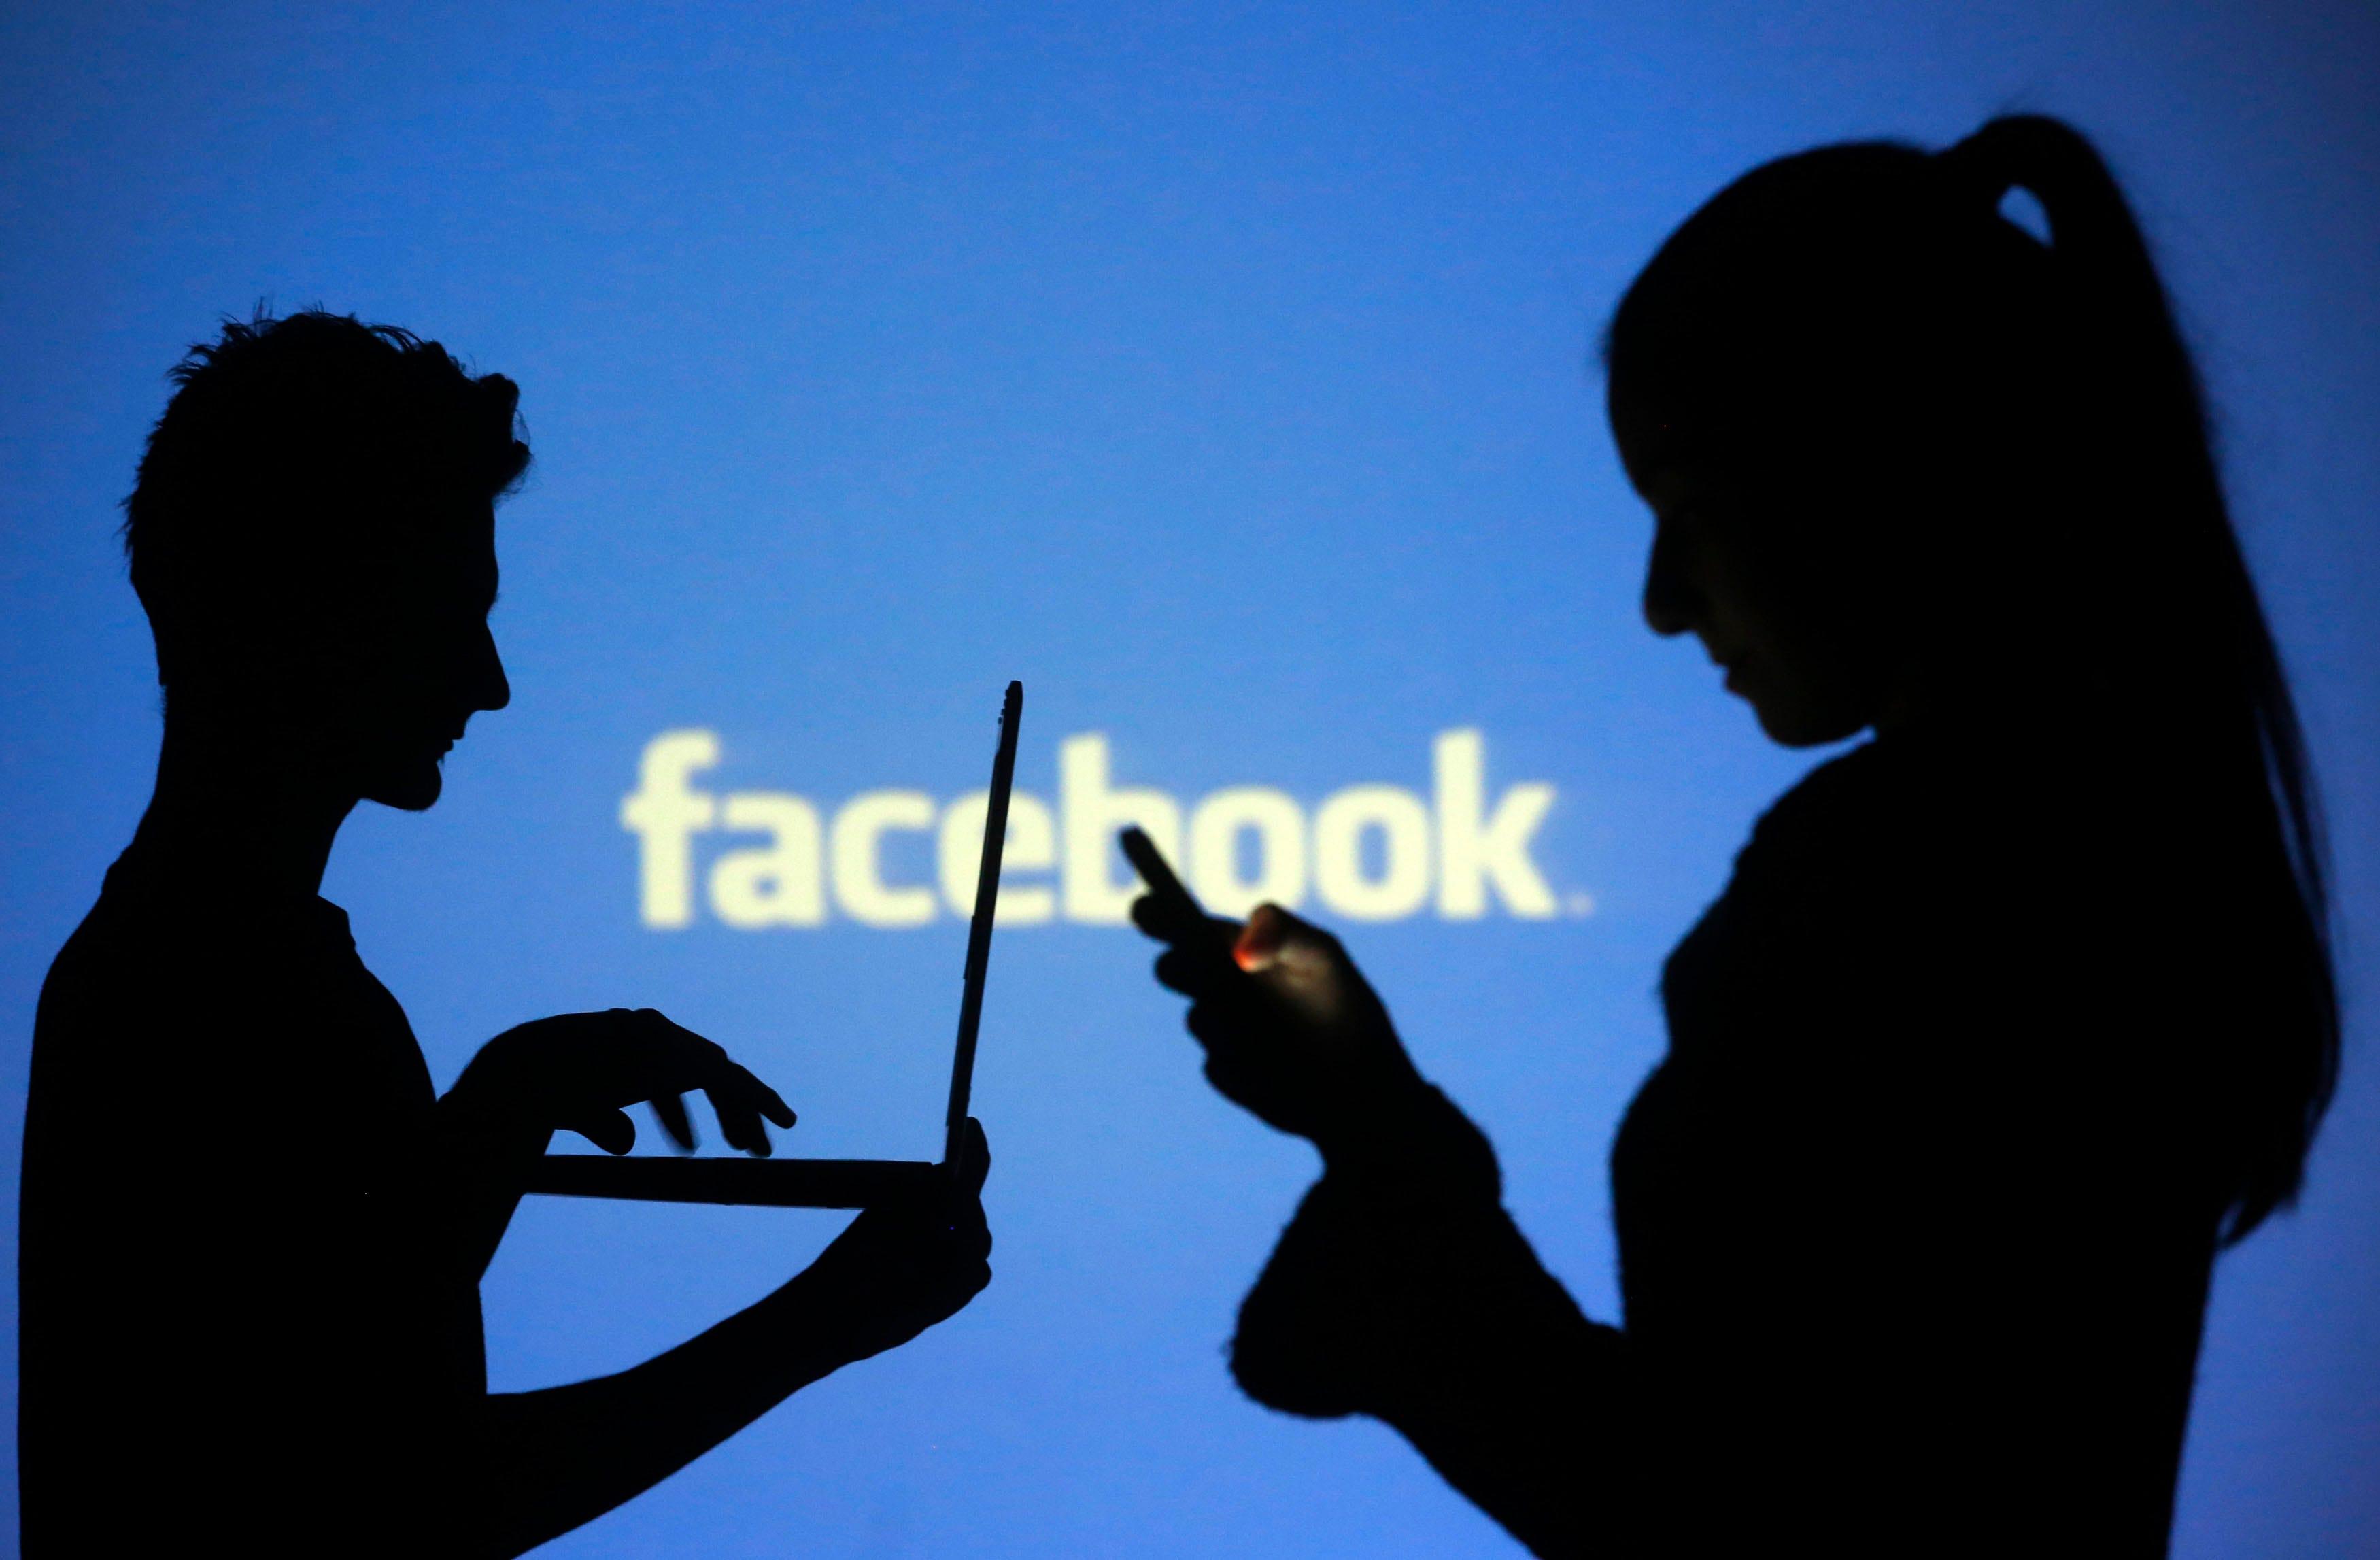 <b>Facebook</b> whistleblowers leak documents revealing effort to censor 'vaccine hesitancy': report thumbnail